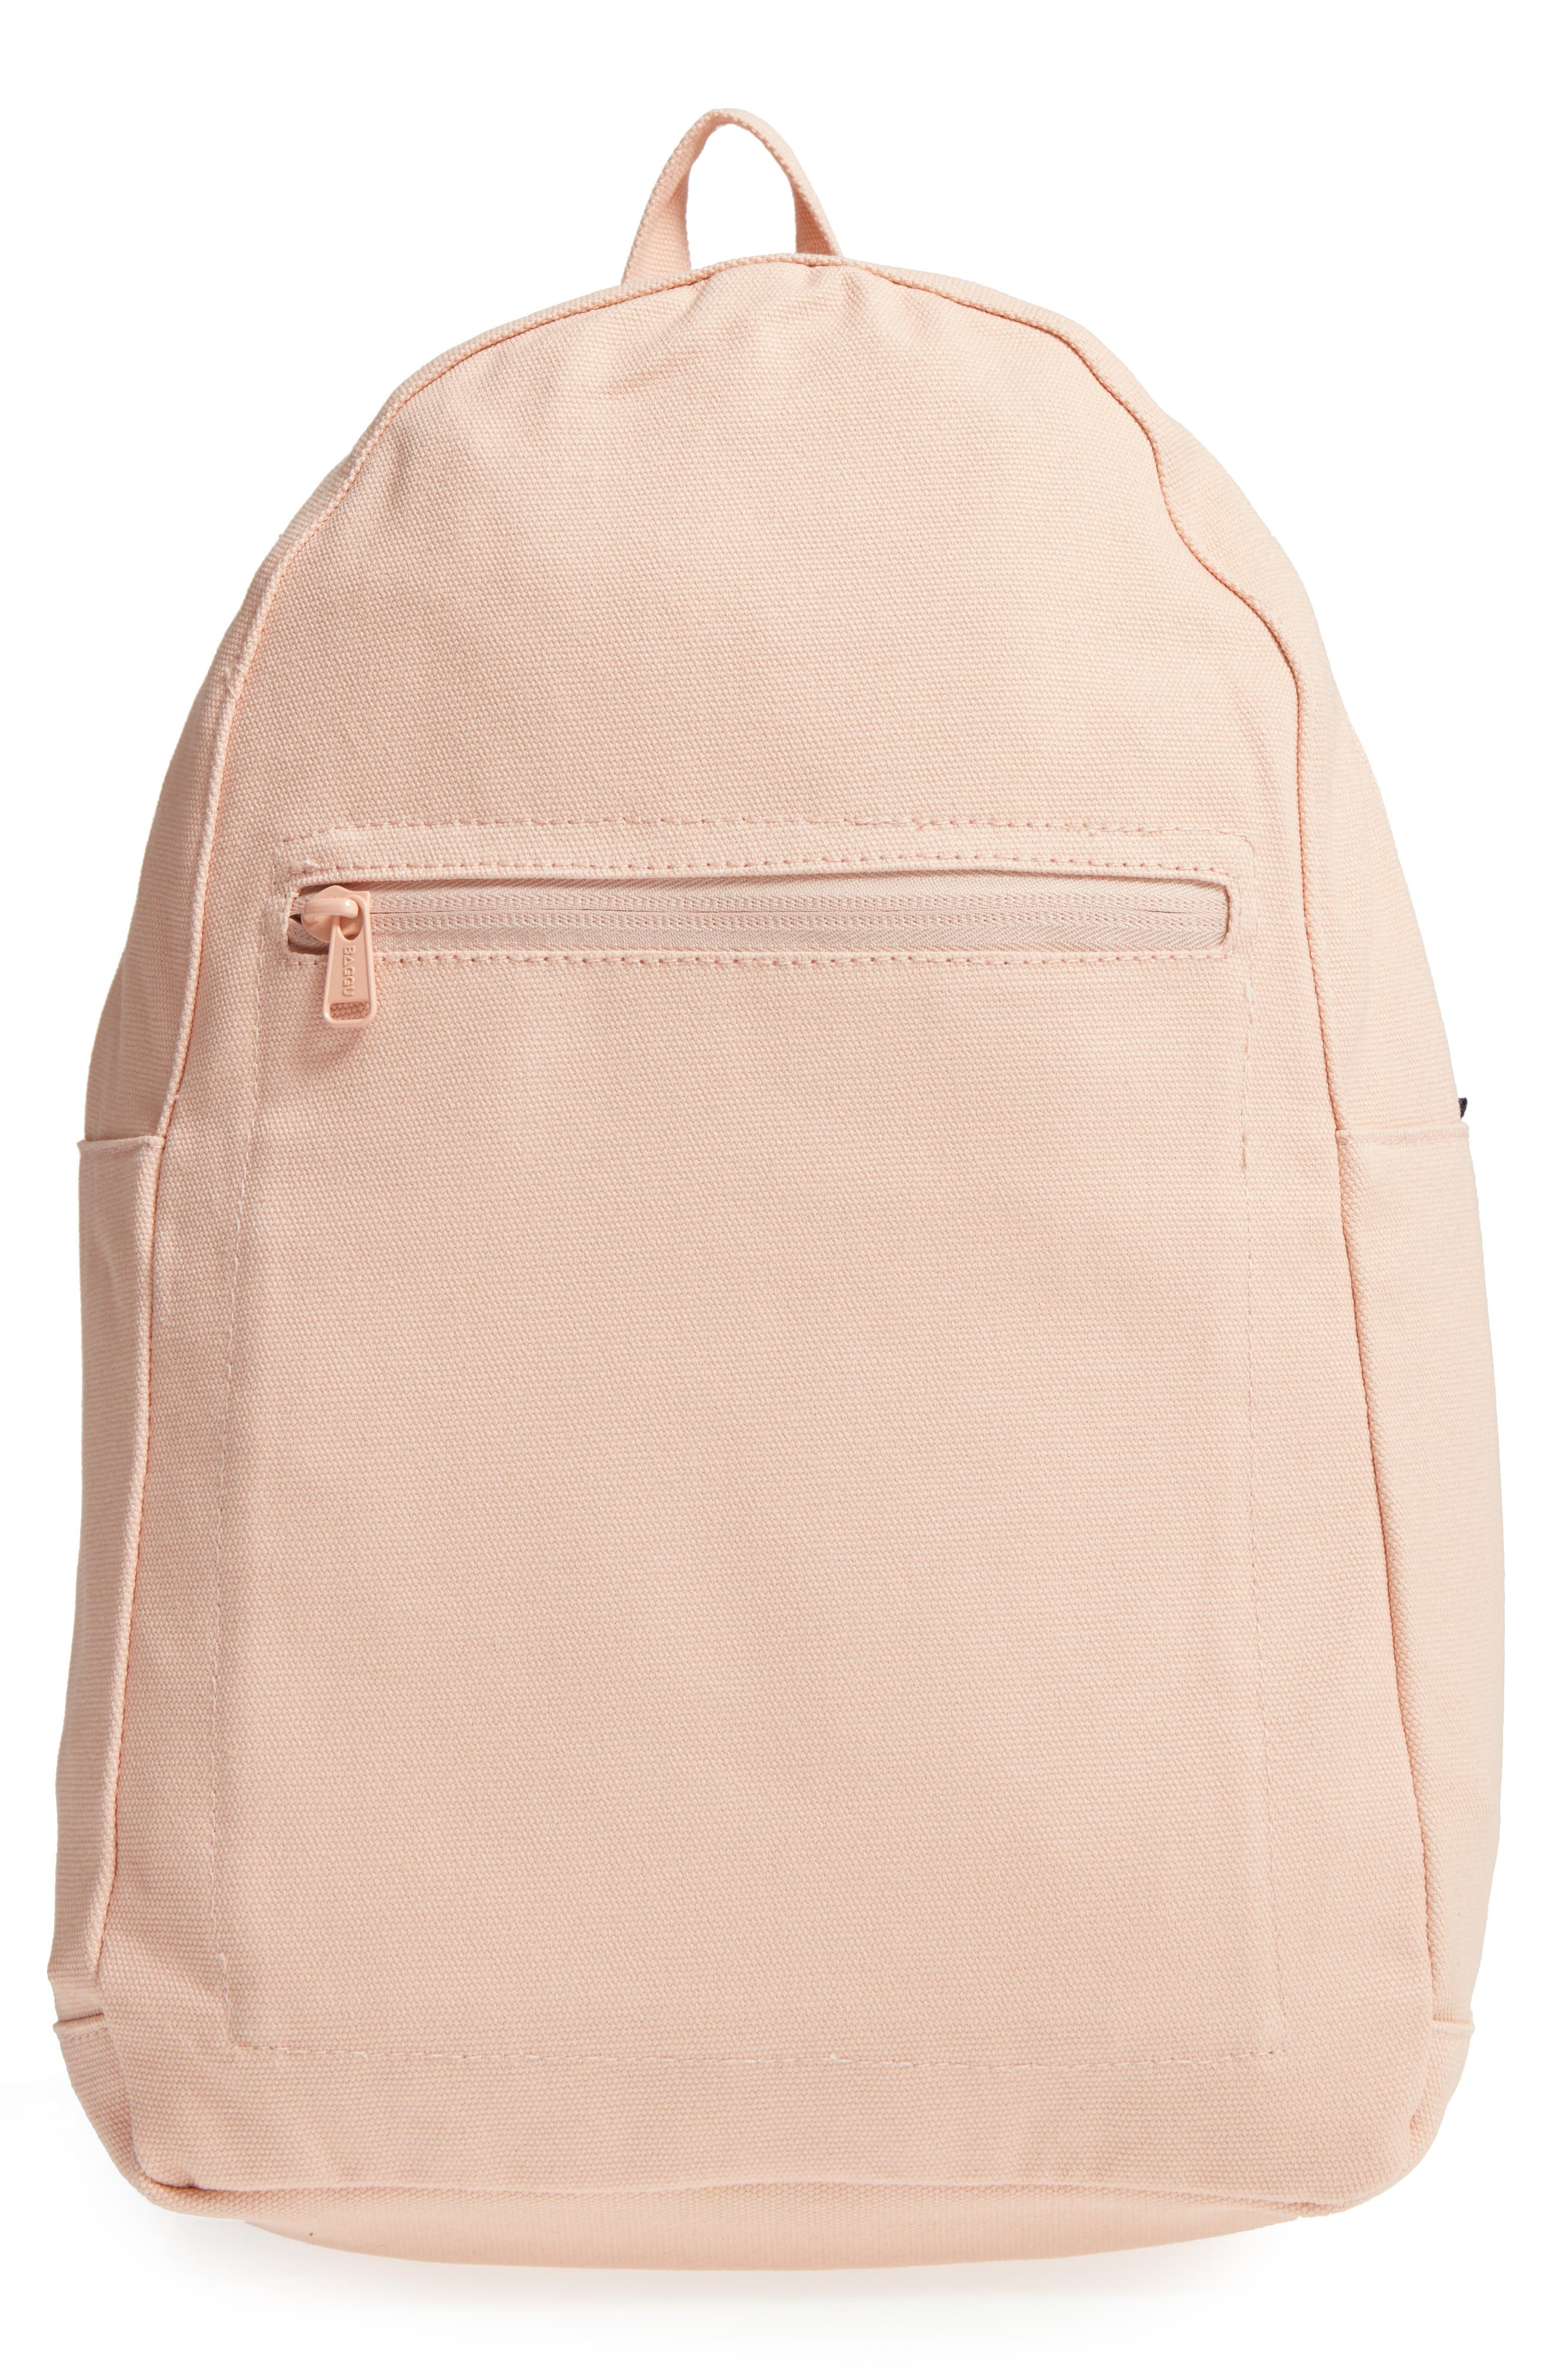 Canvas Backpack,                             Main thumbnail 1, color,                             Shell